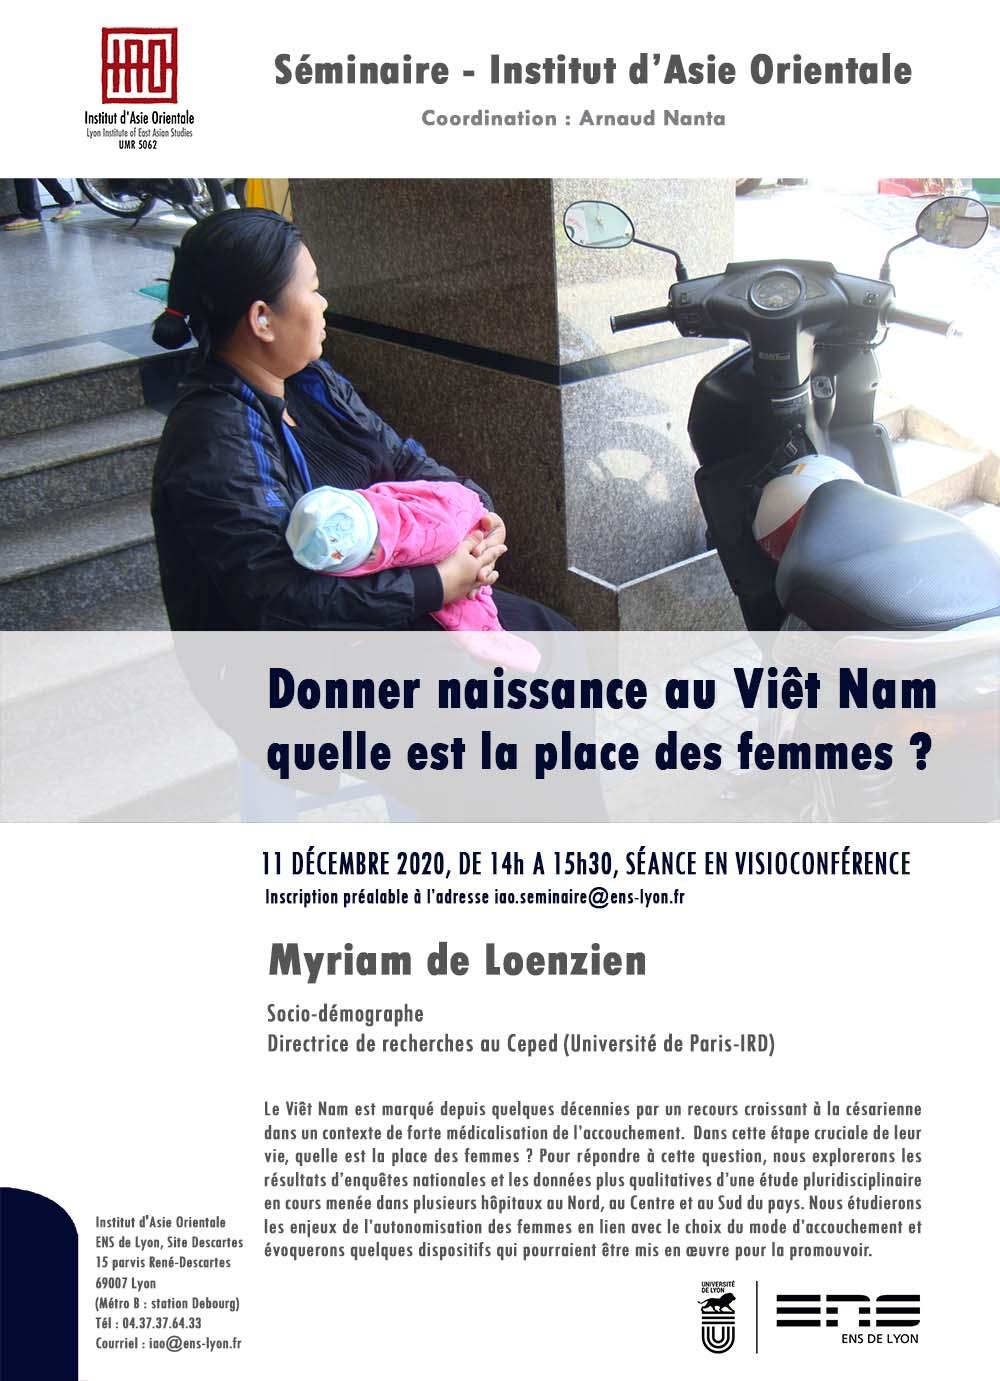 Séminaire de Myriam de Loenzien